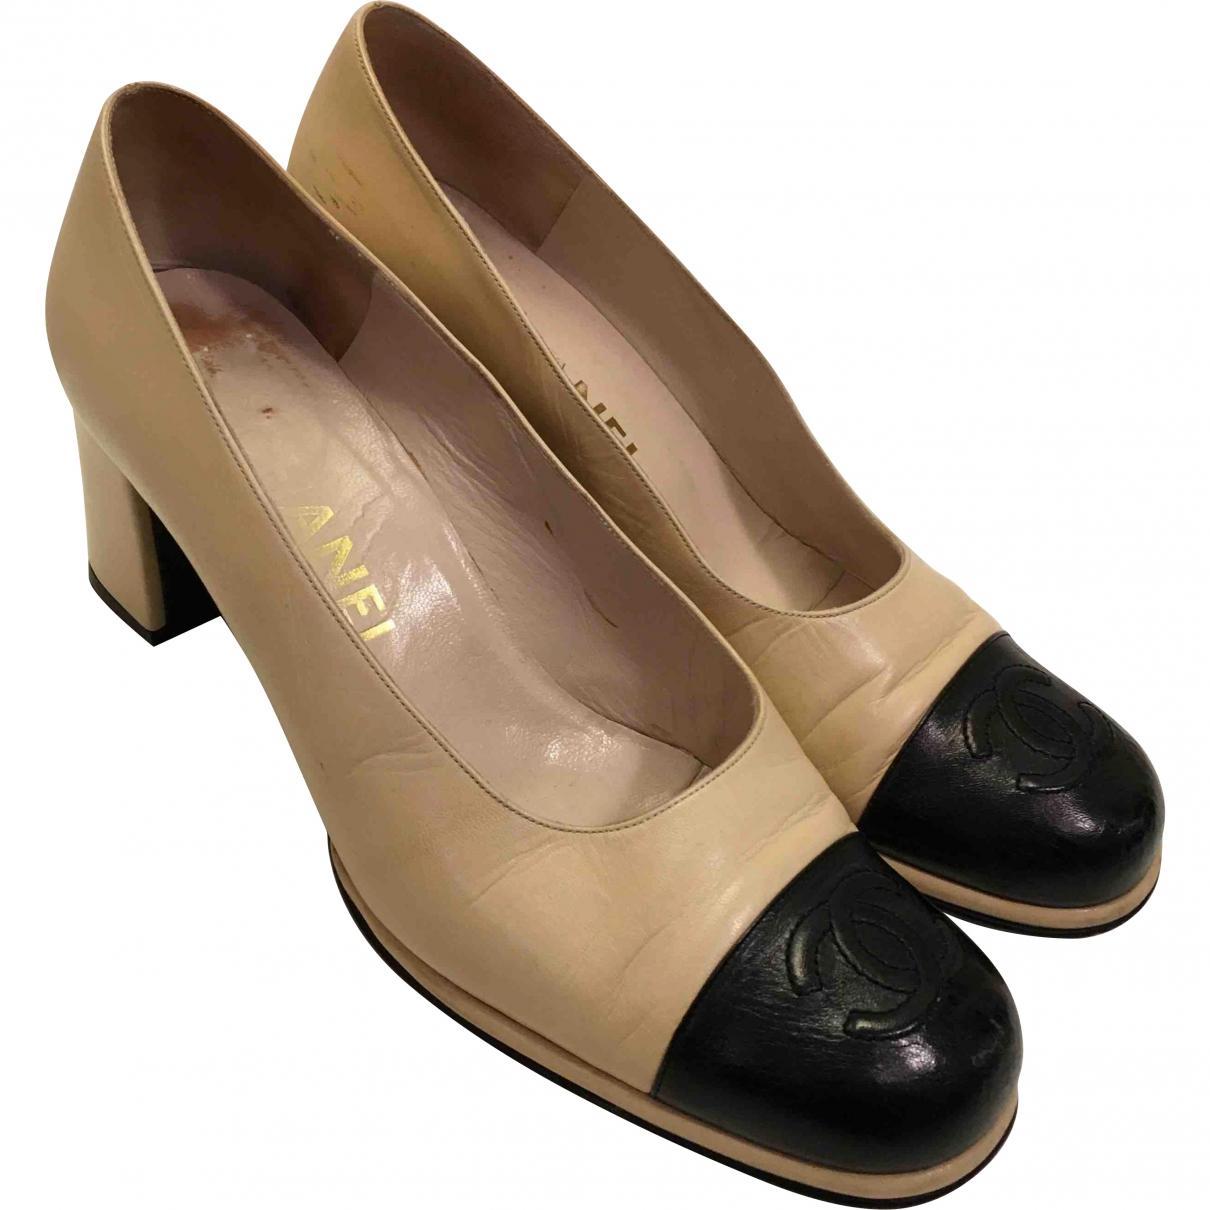 Barneys Chanel Shoes Sale